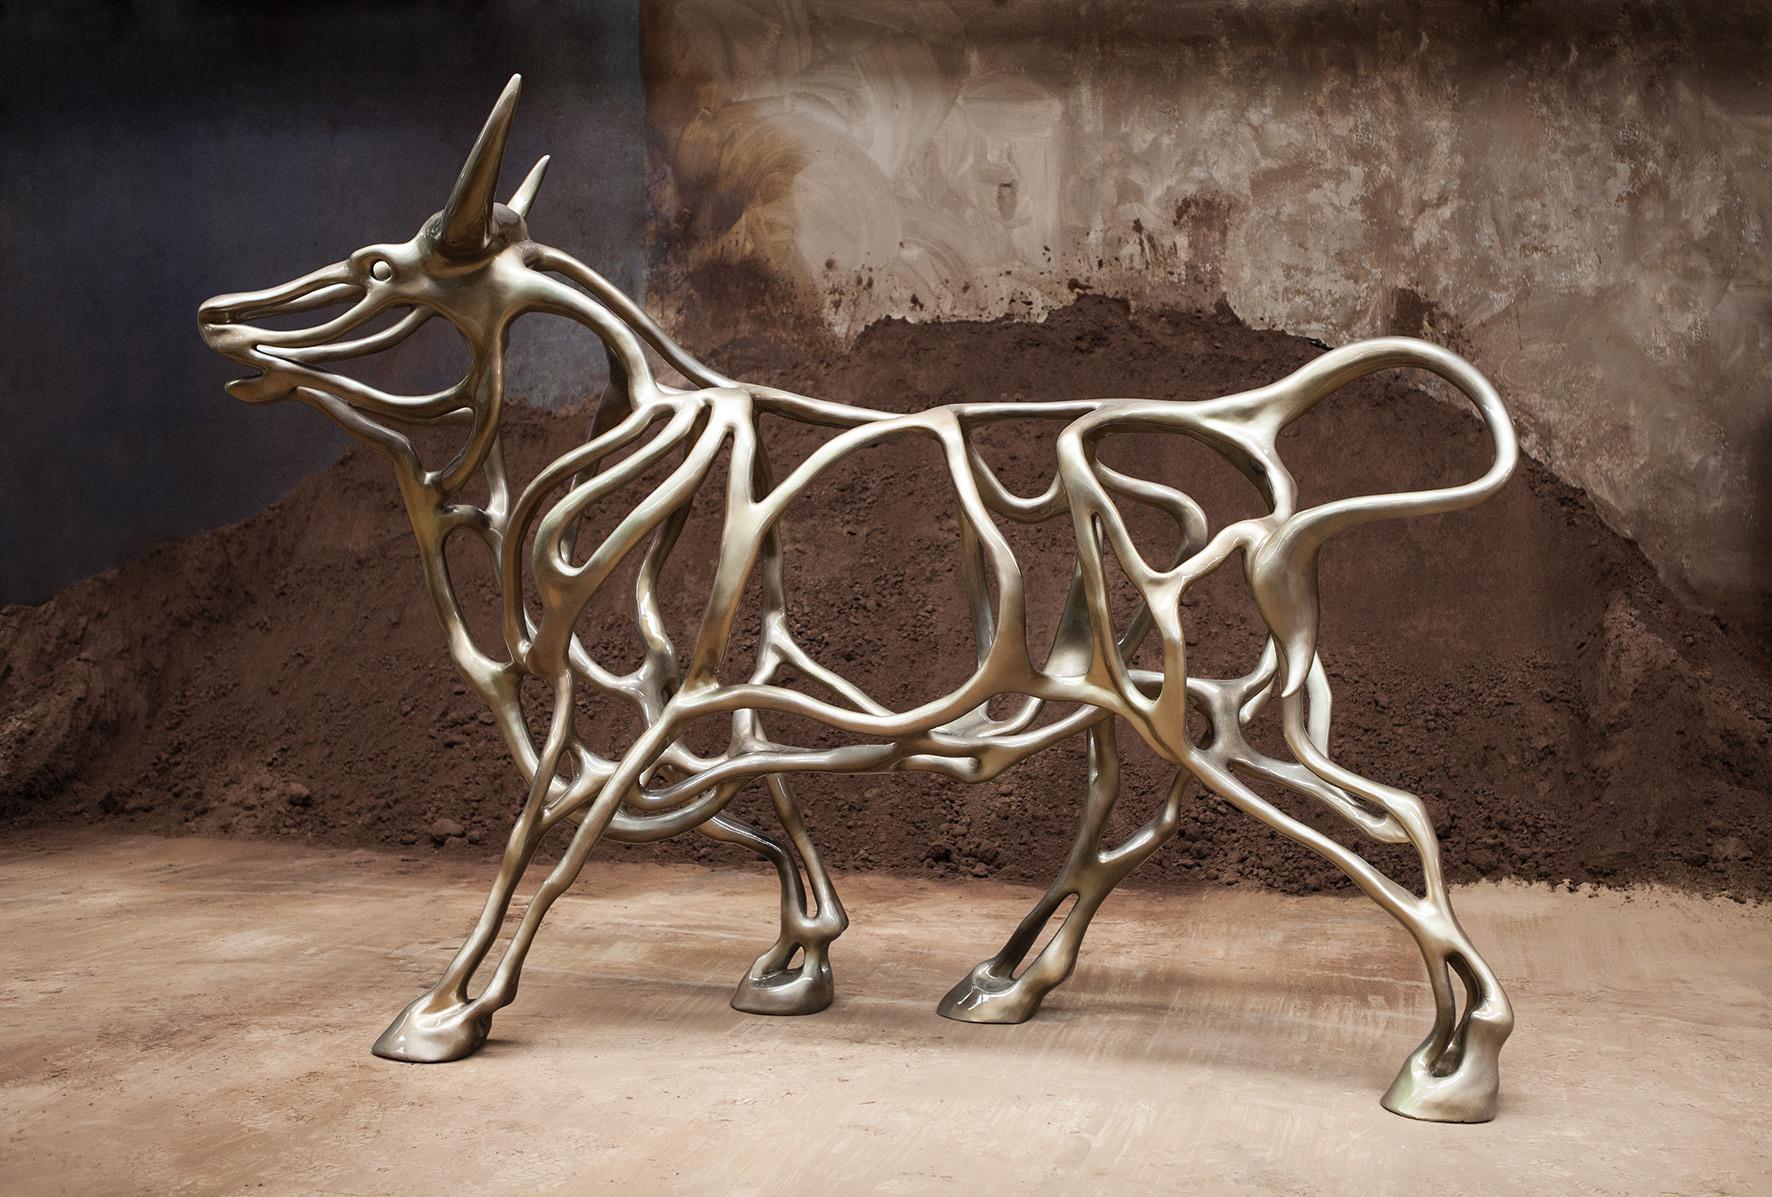 Richard Texier - Artist - Sculpture - Bull - 04 - 300x202x100cm - 2015_4.jpg